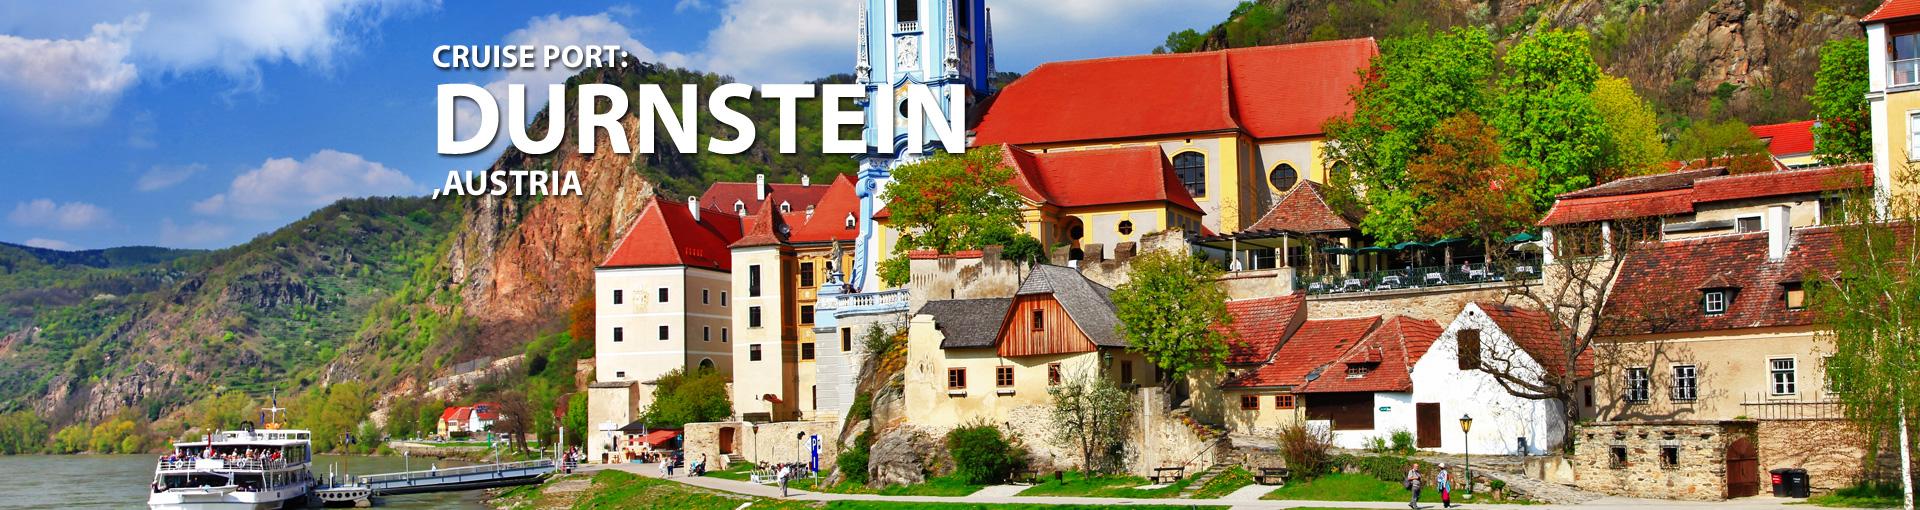 Cruises to Durnstein, Austria